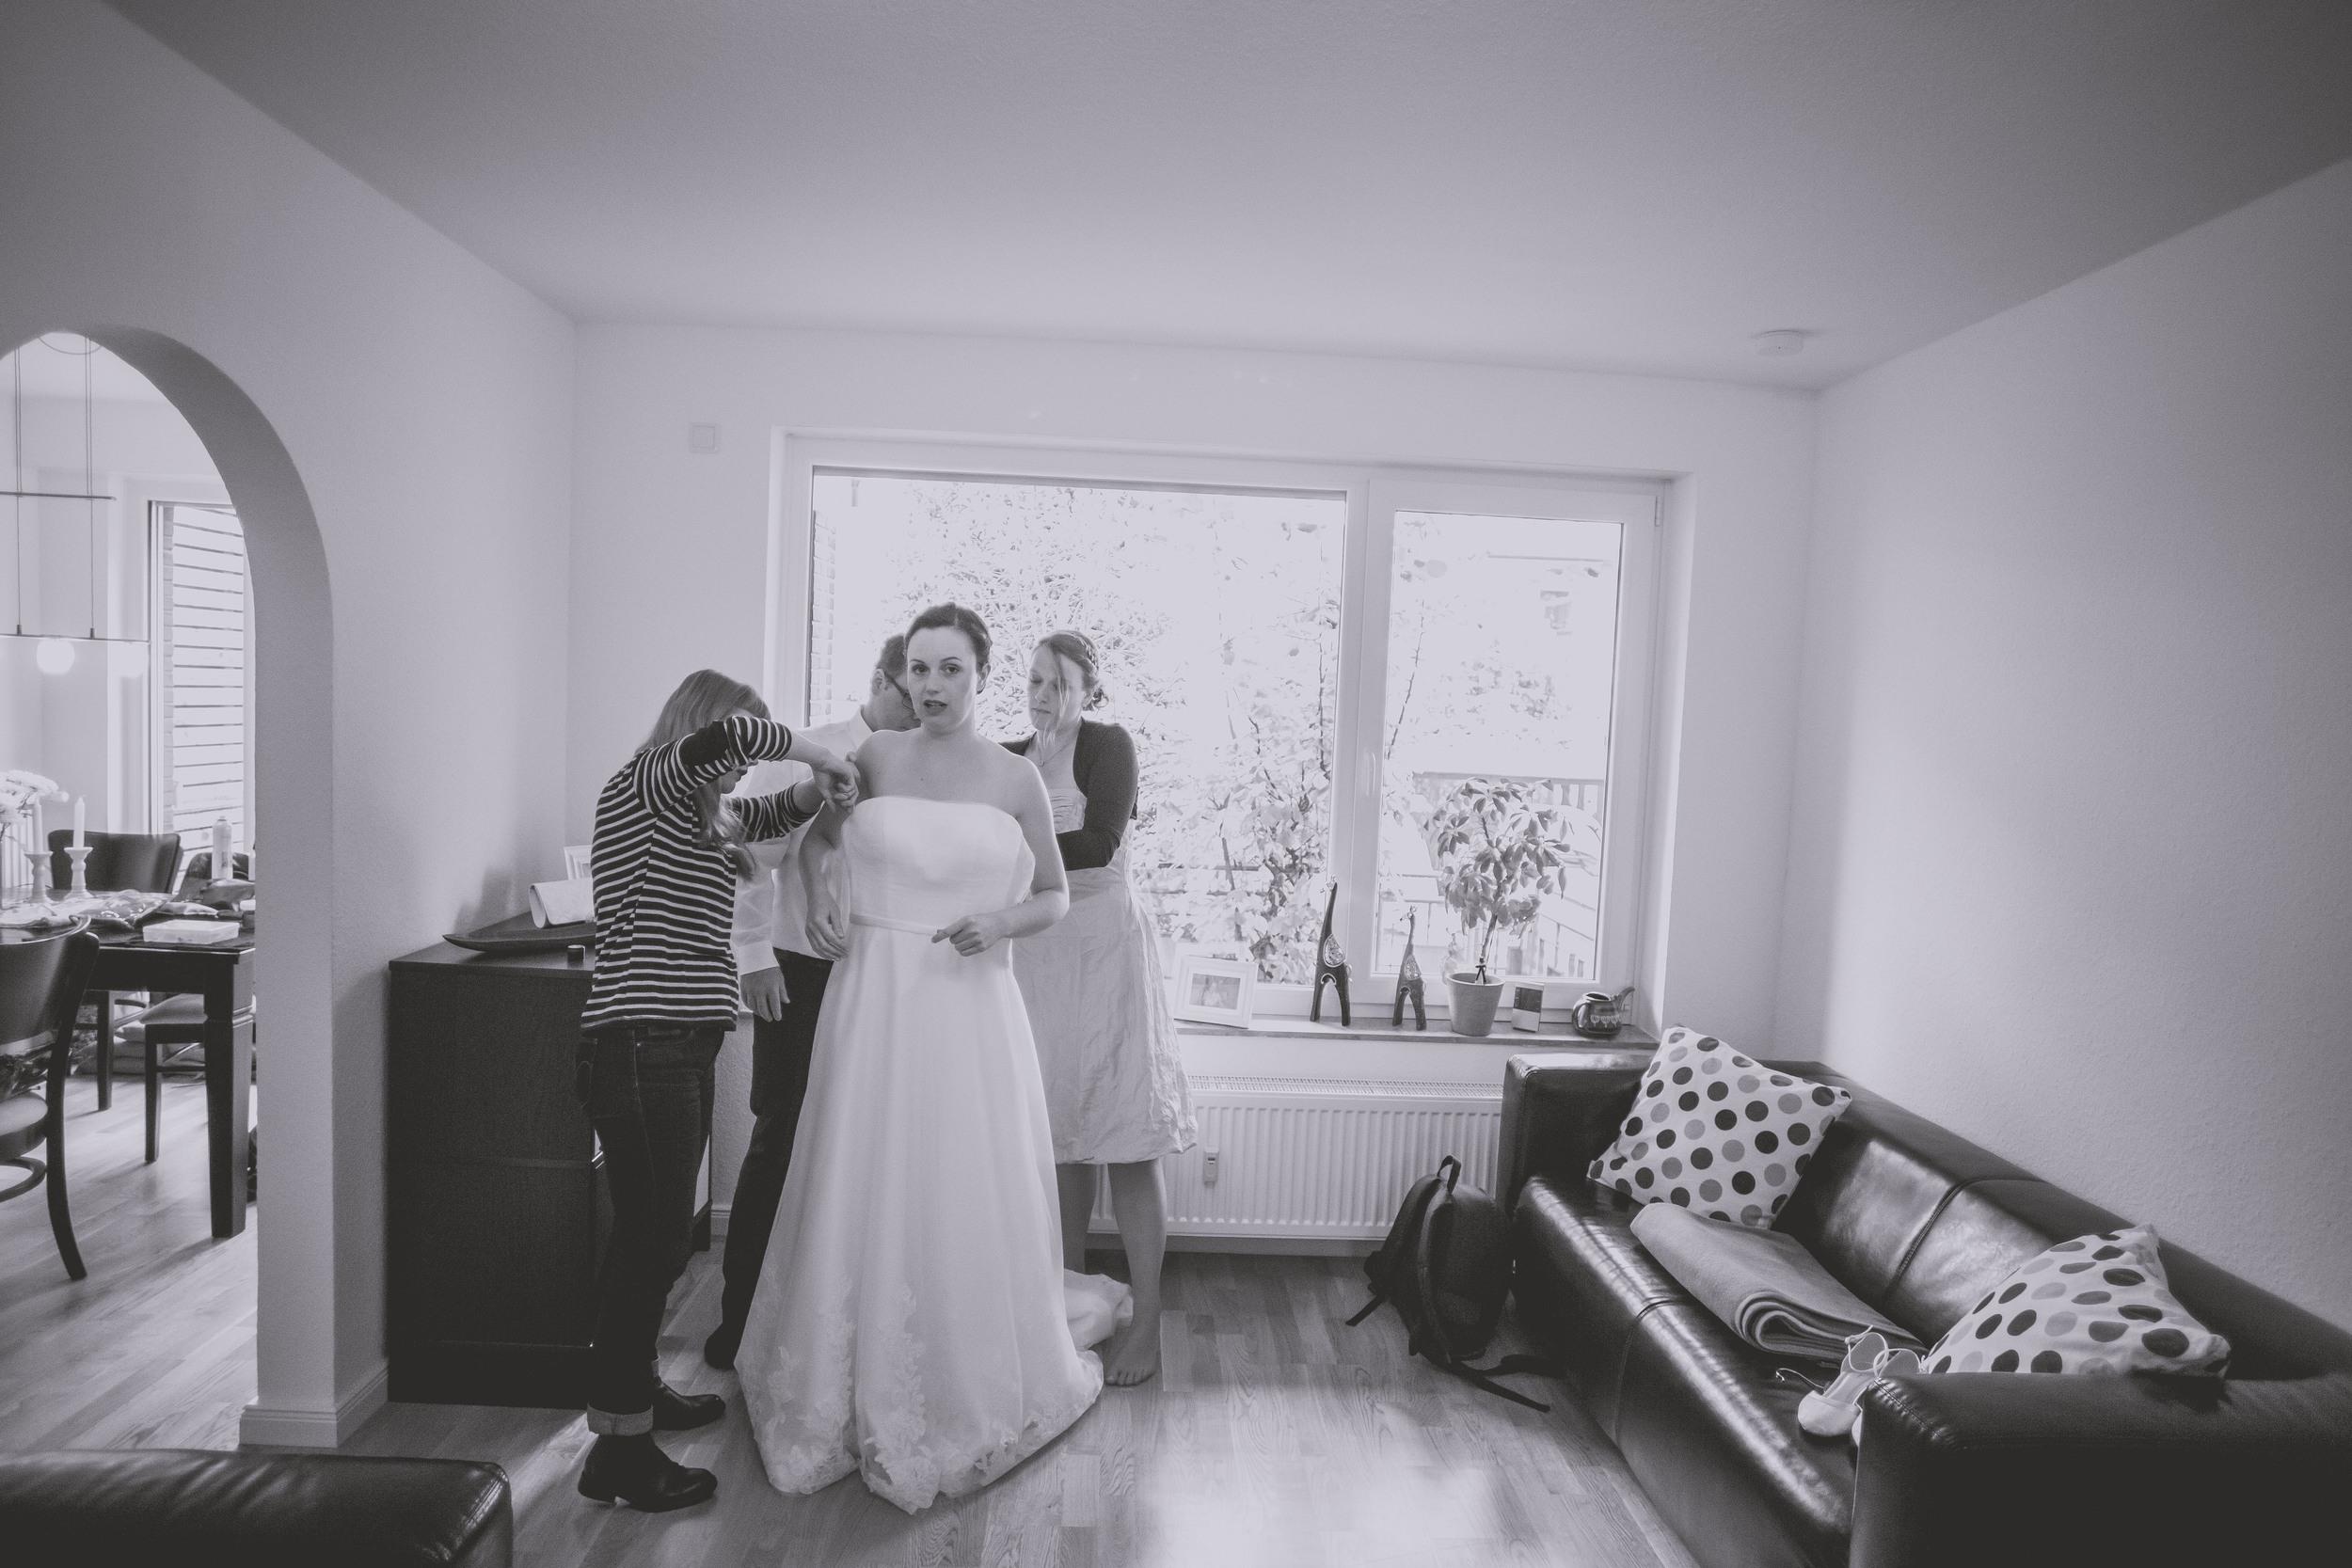 Buffalo-Wedding-Photography-by-Stefan-Ludwig10252014WEB-8.jpg